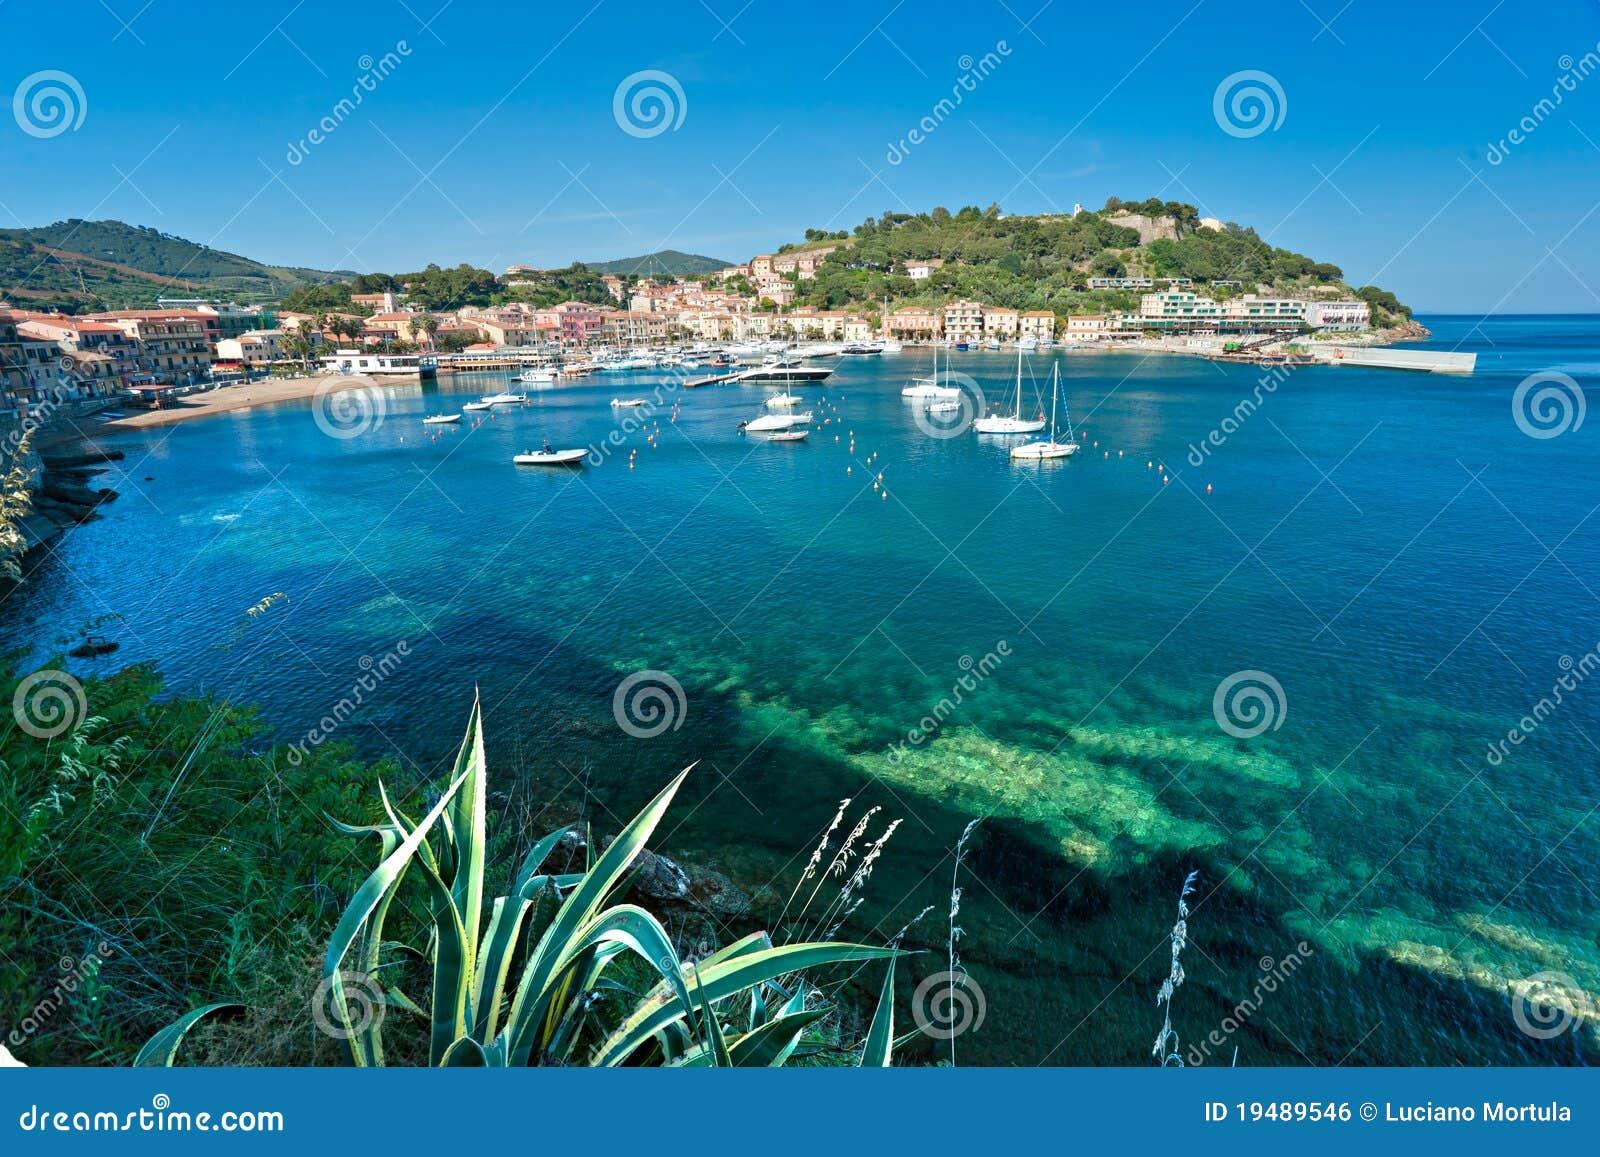 Portoazzurro, Insel von Elba, Italien.